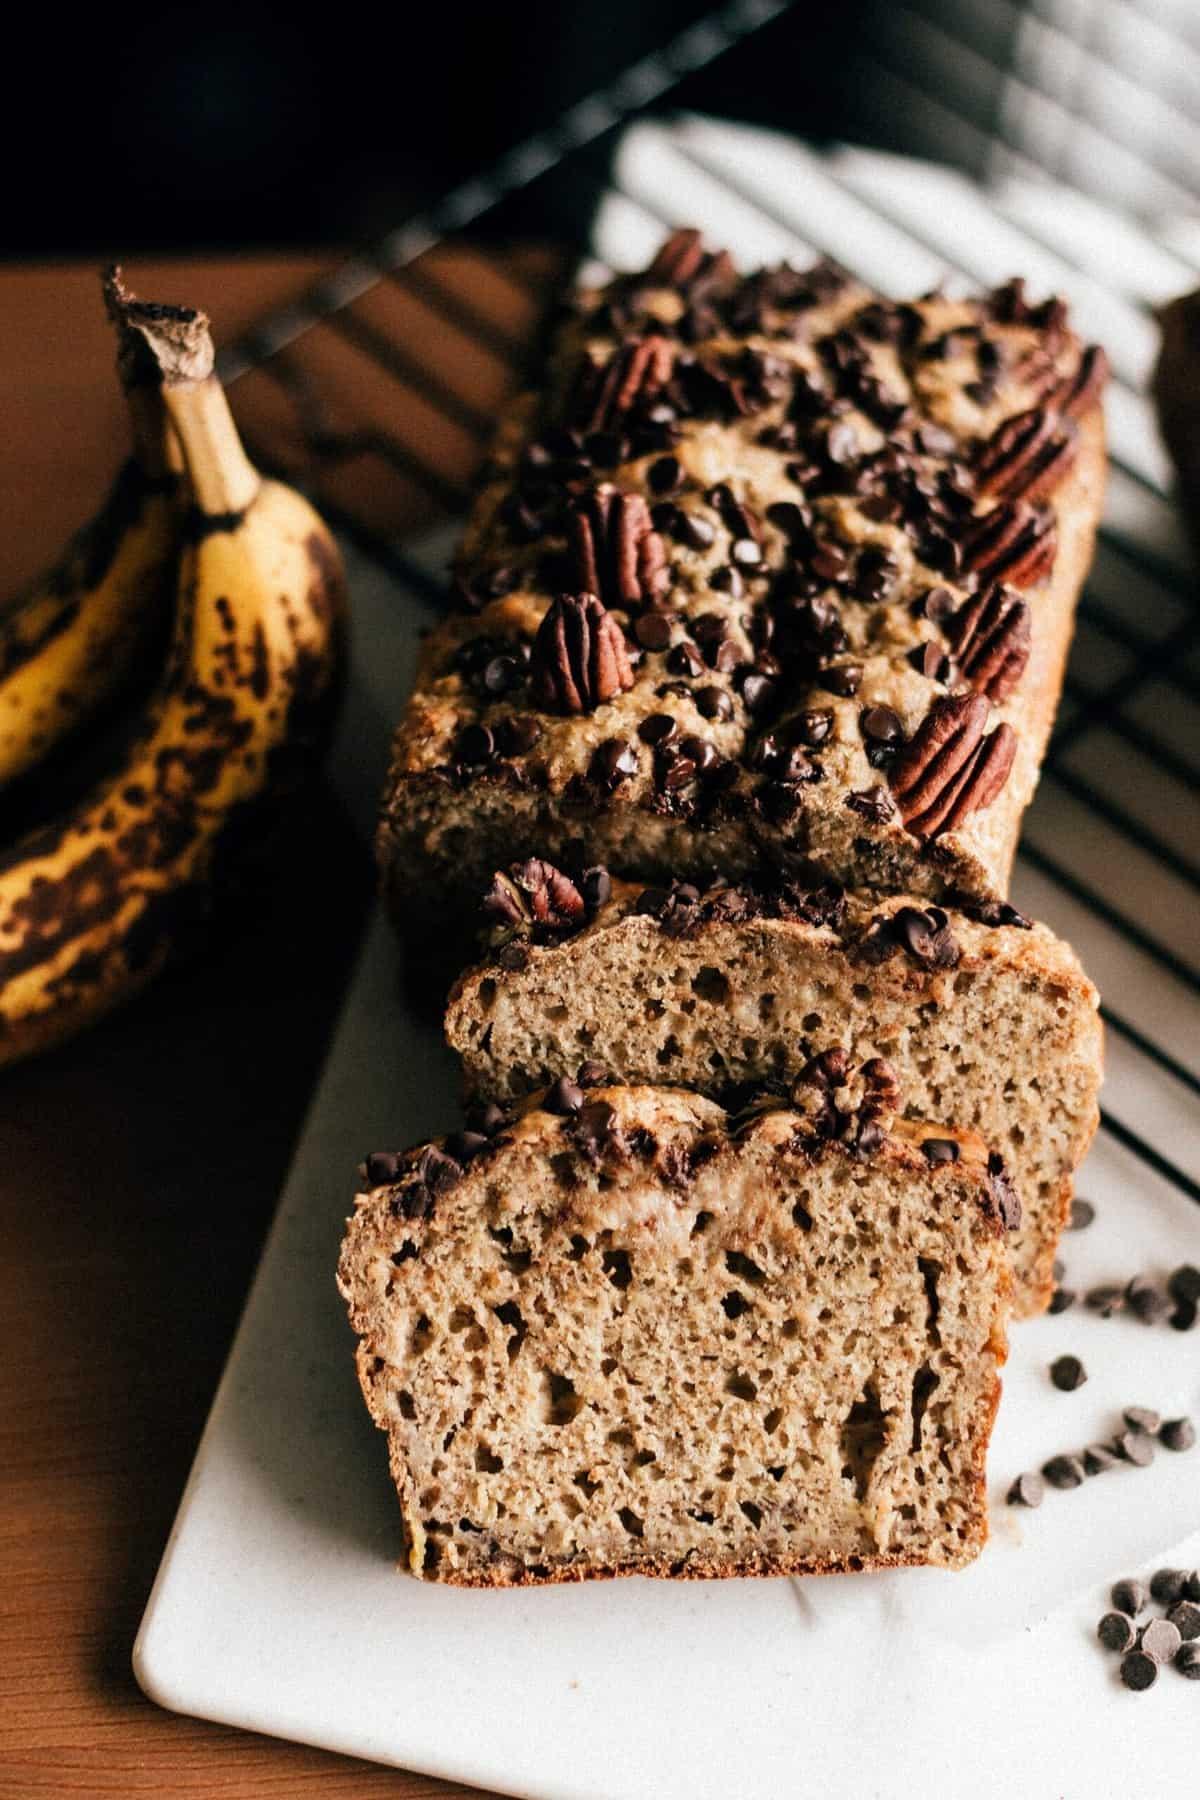 Freshly baked banana bread made from healthy flour.